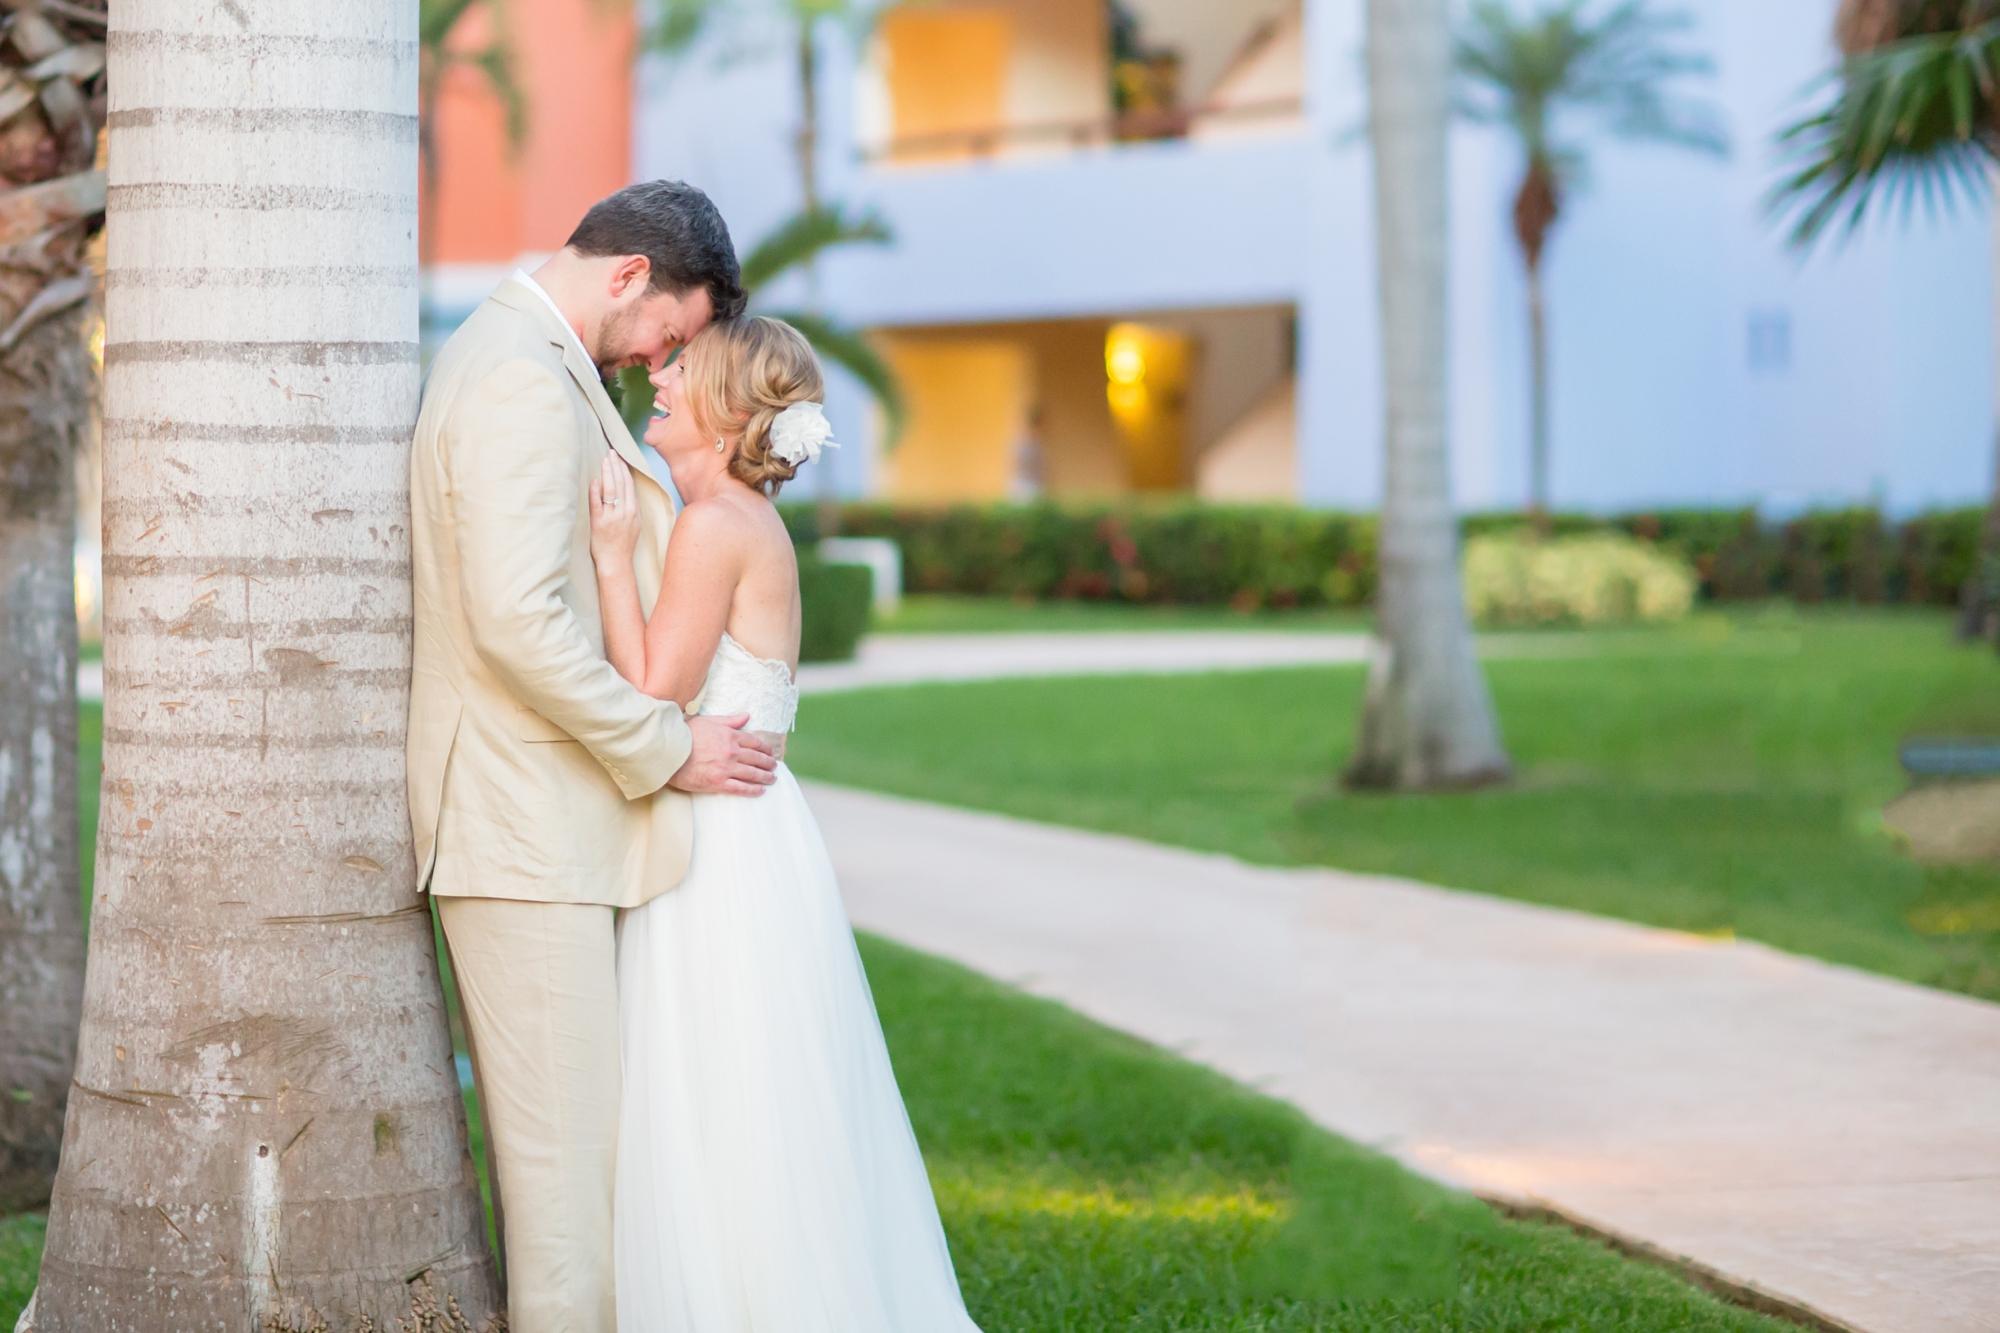 Morosoff Wedding 4-Bride & Groom Portraits-567_anna grace photography destination wedding photographer playa del carmen mexico photo.jpg